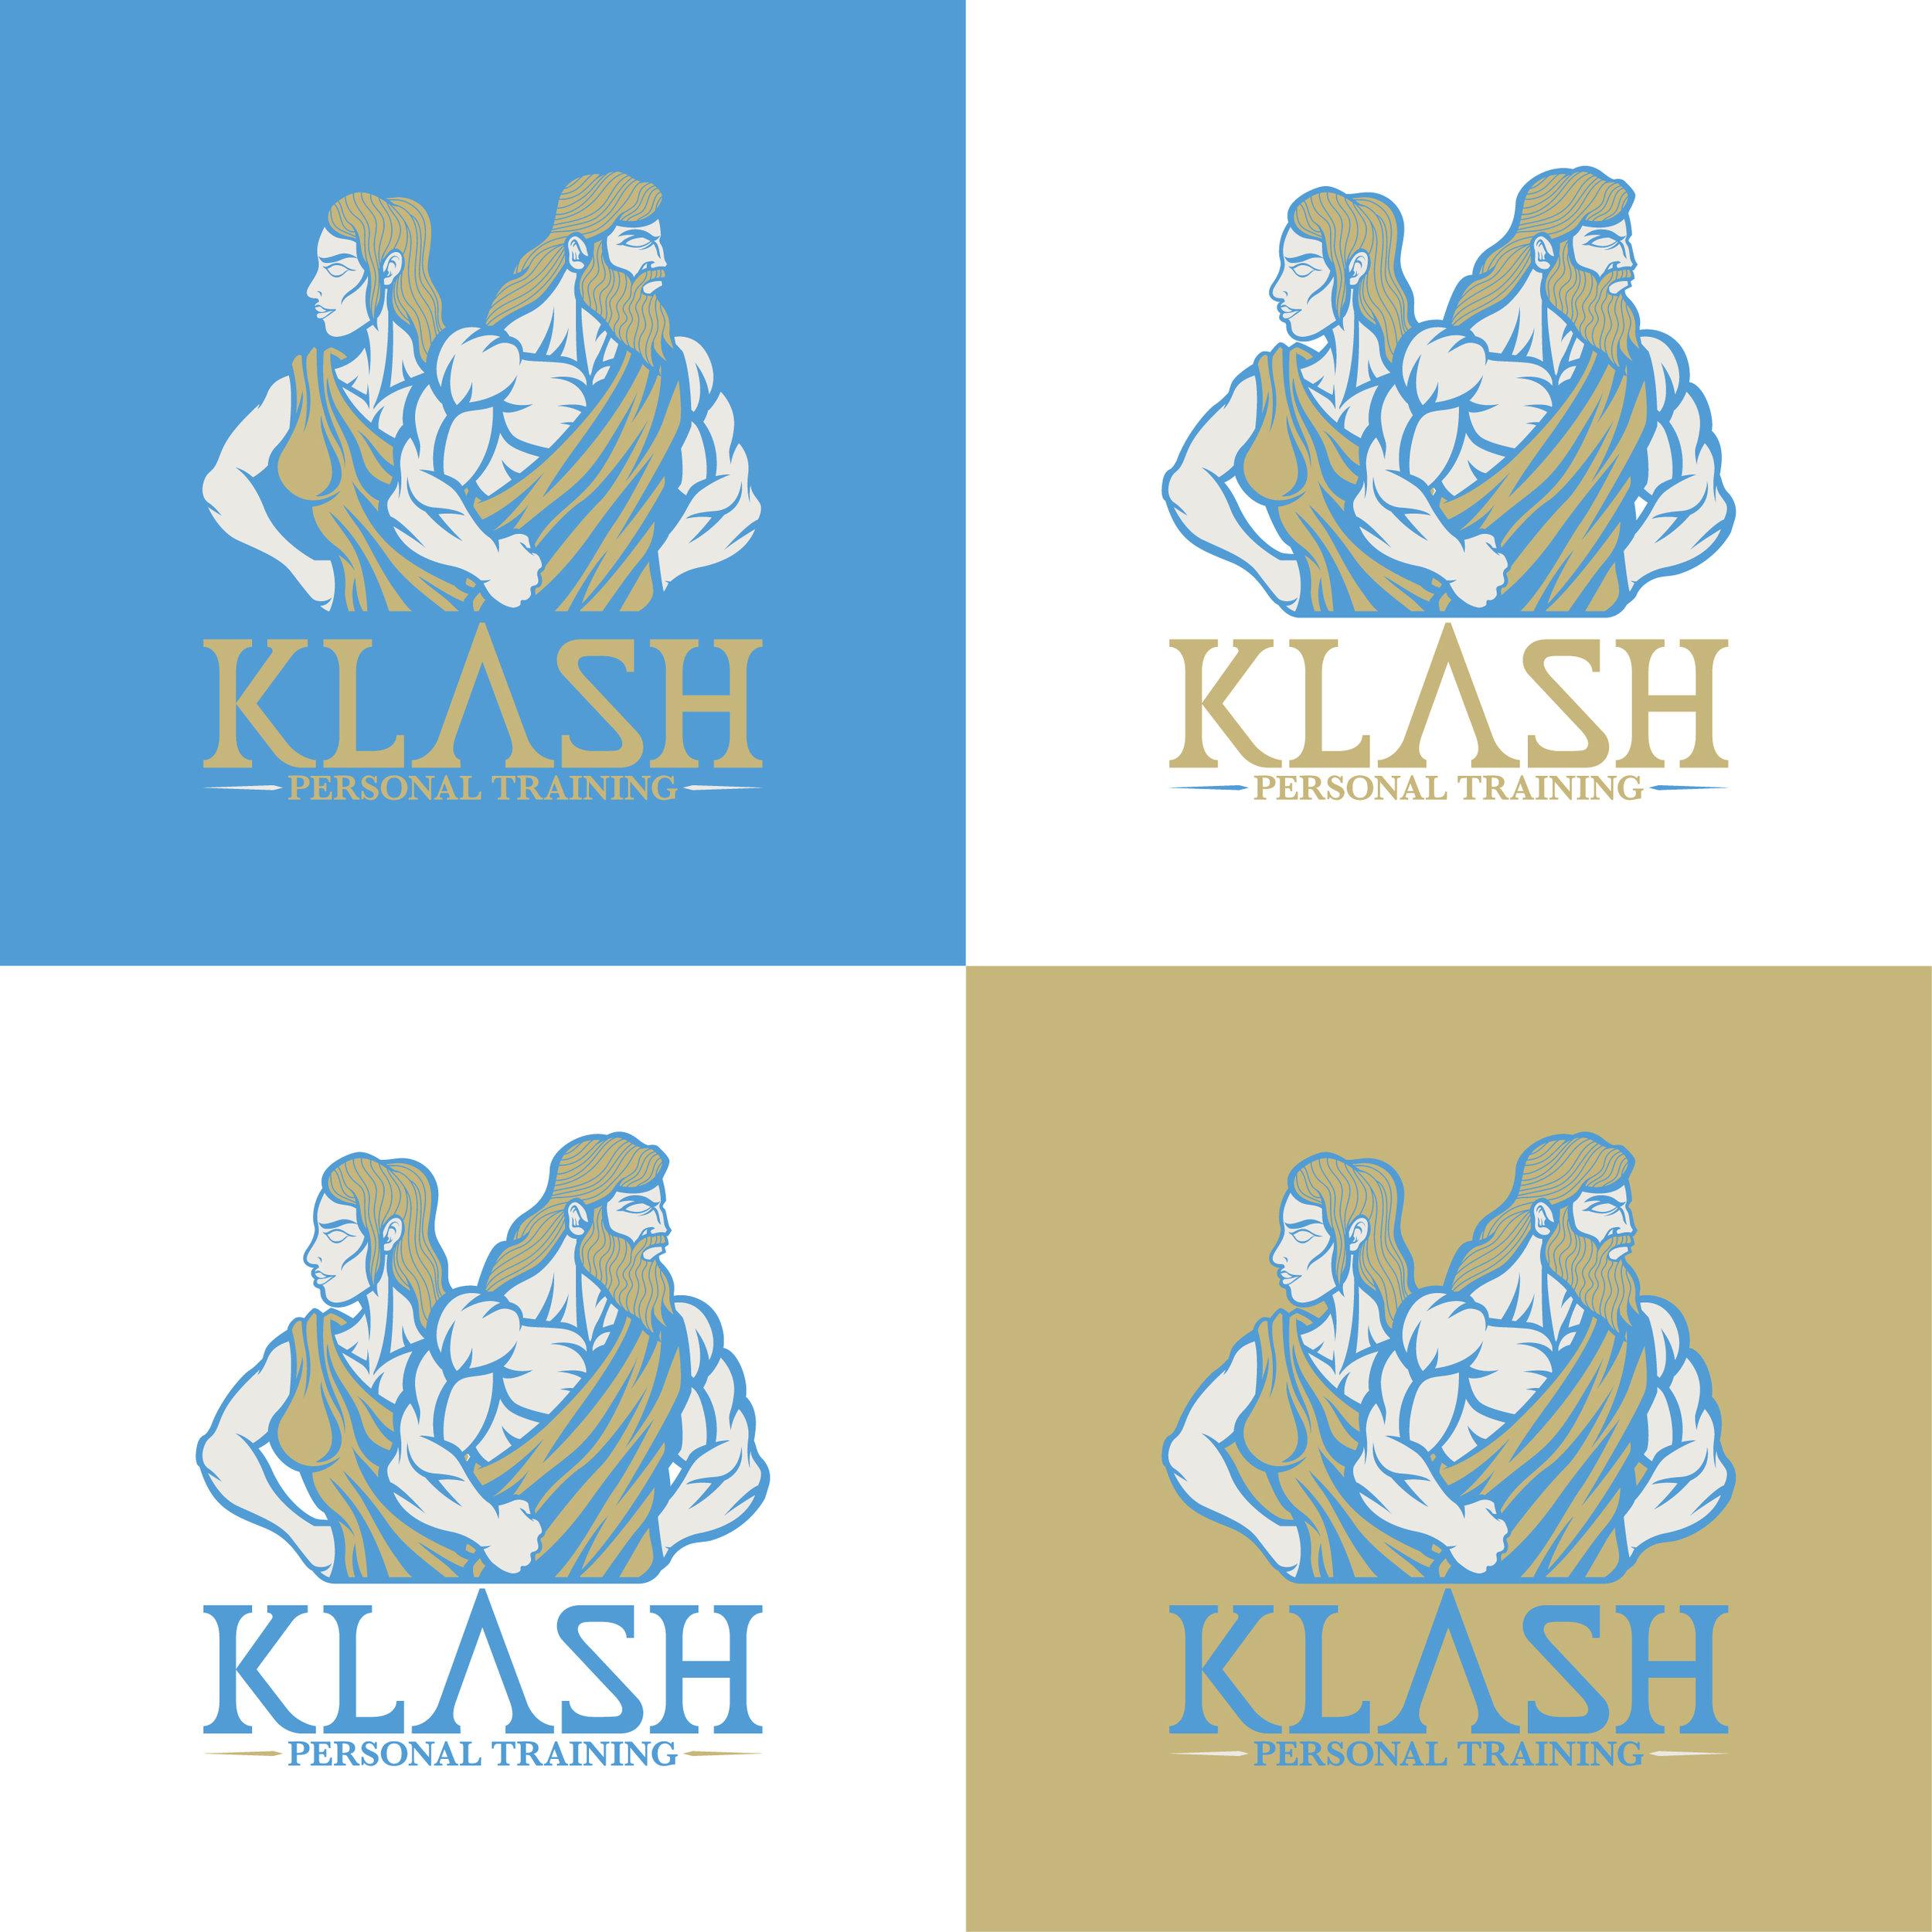 klash-personal-training-logo-logos-branding-greek-roman-graphicdesign-orozco-design-roberto-identity-vegas-lasvegas-vector-digitalart.jpg